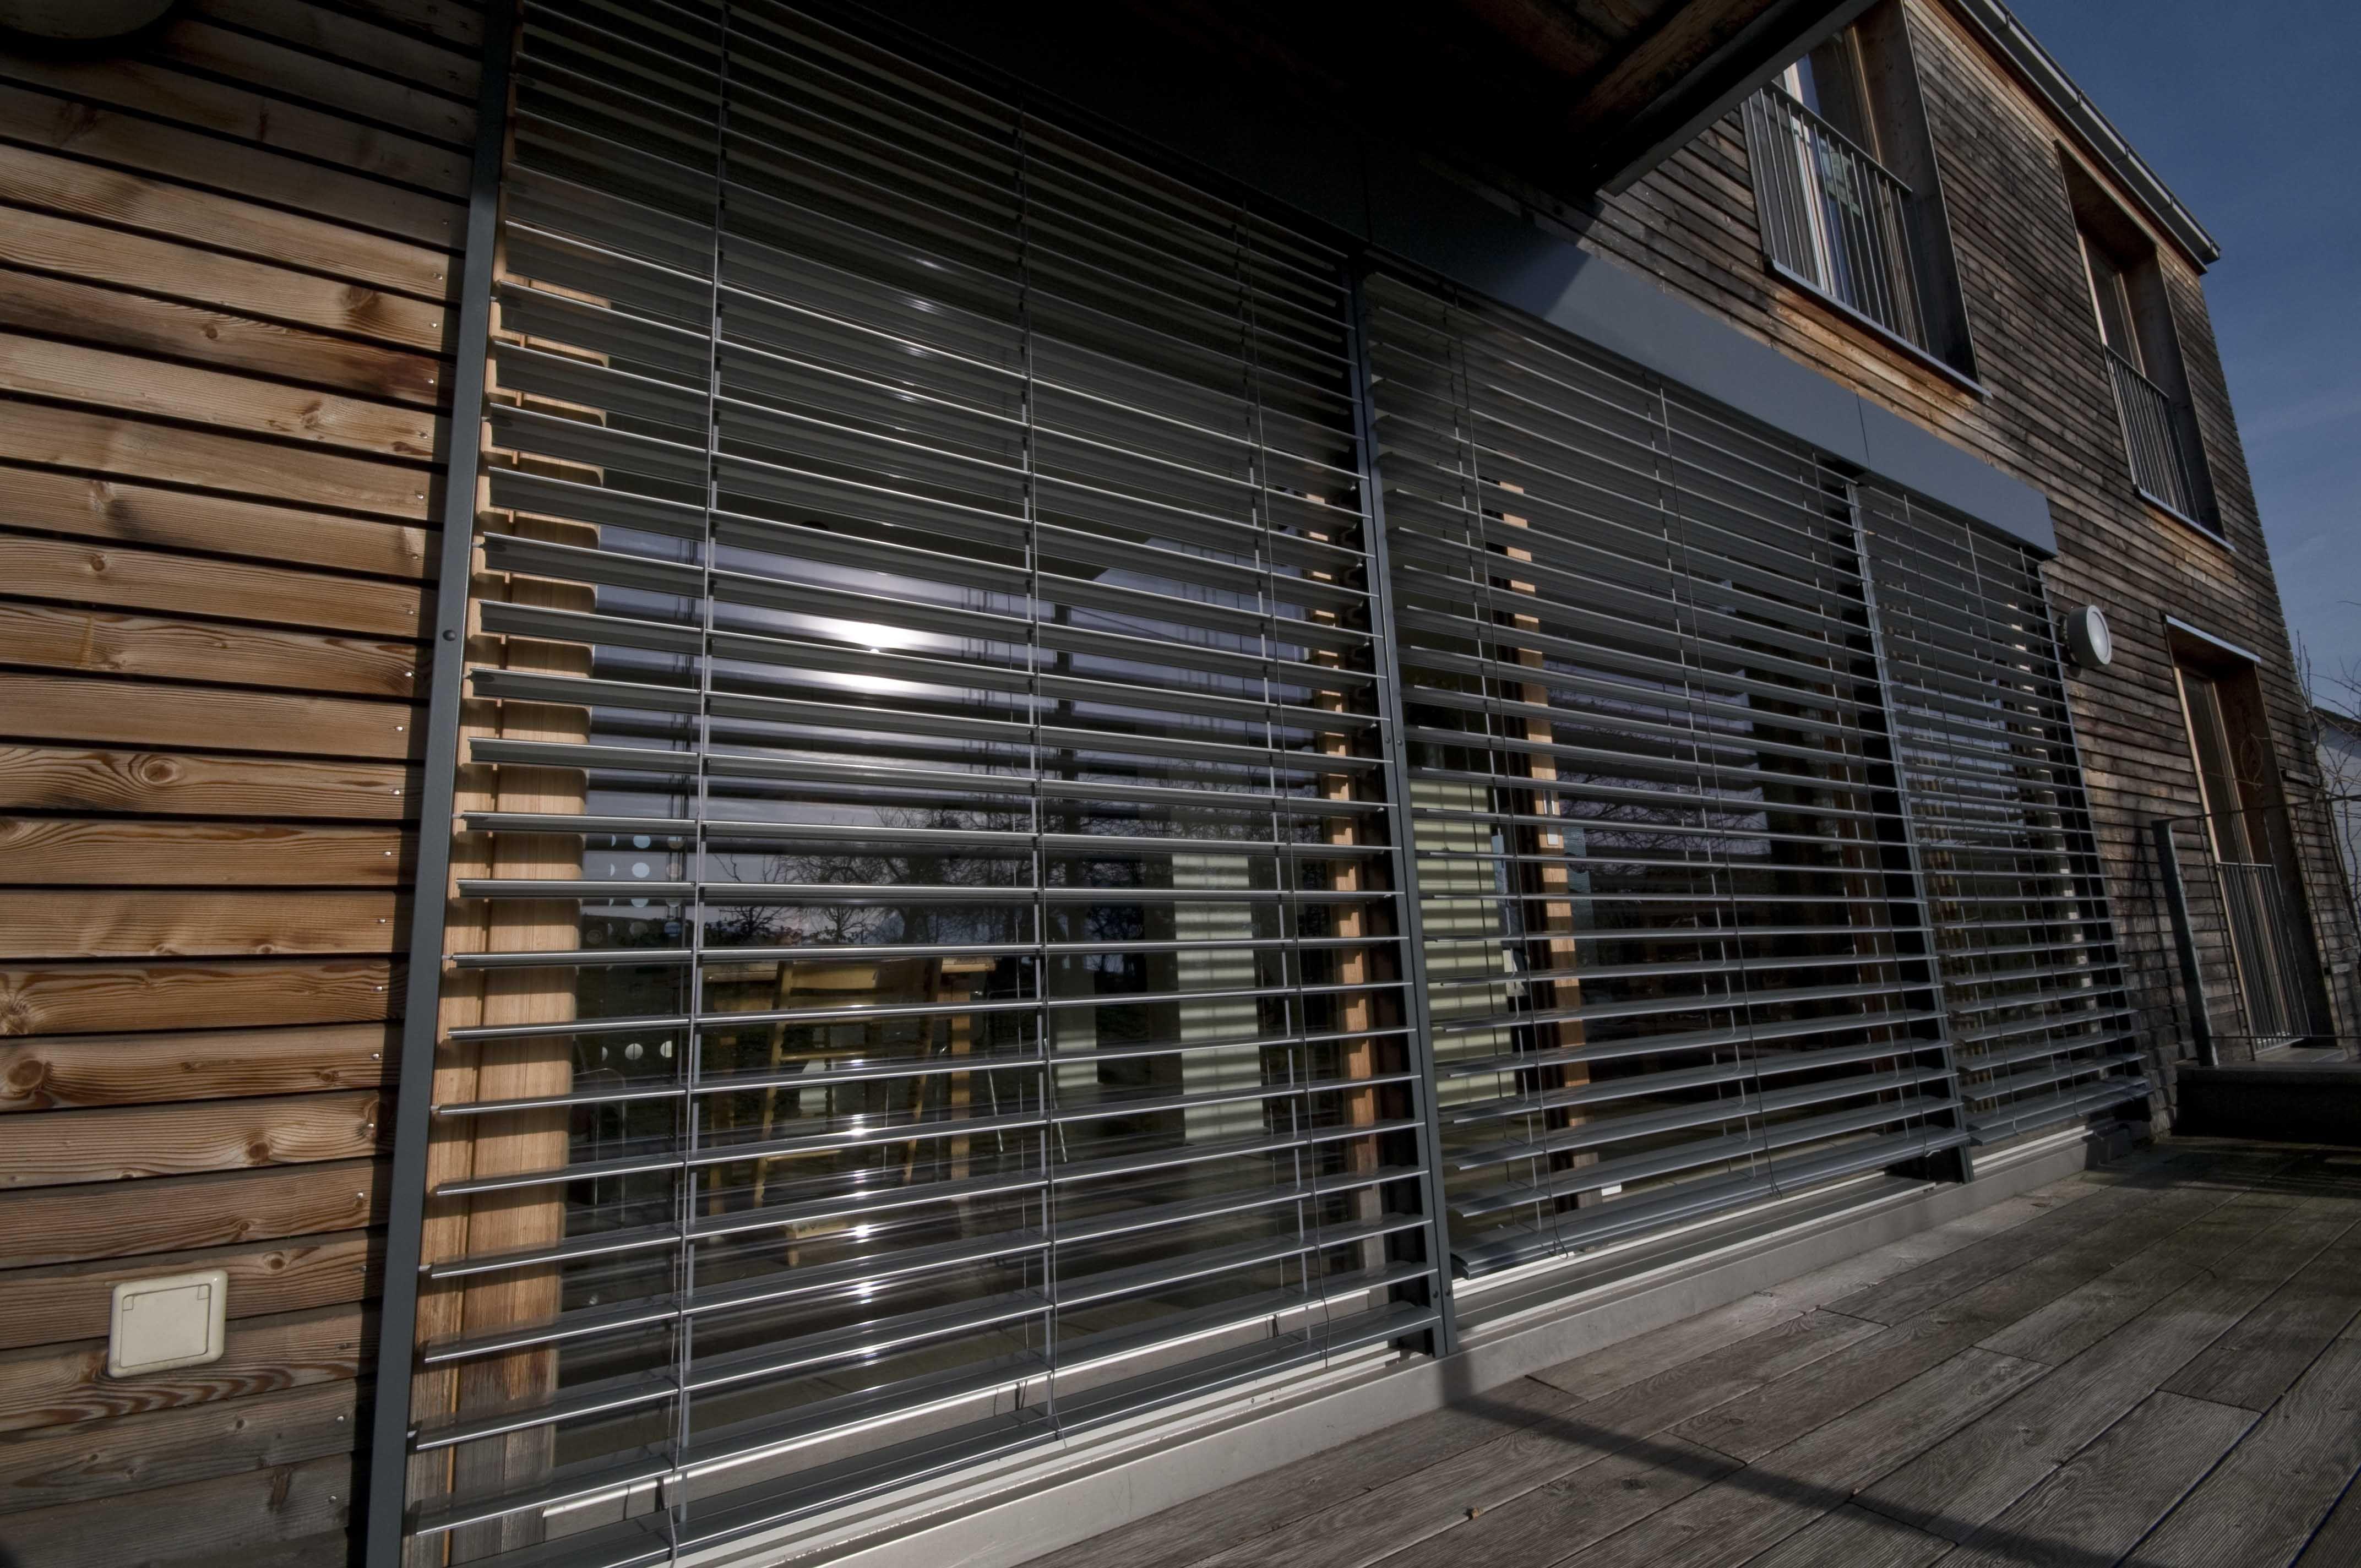 Solid Fenster Erfahrungen schlotterer raffstore schattenspender pinned by wagner fenster